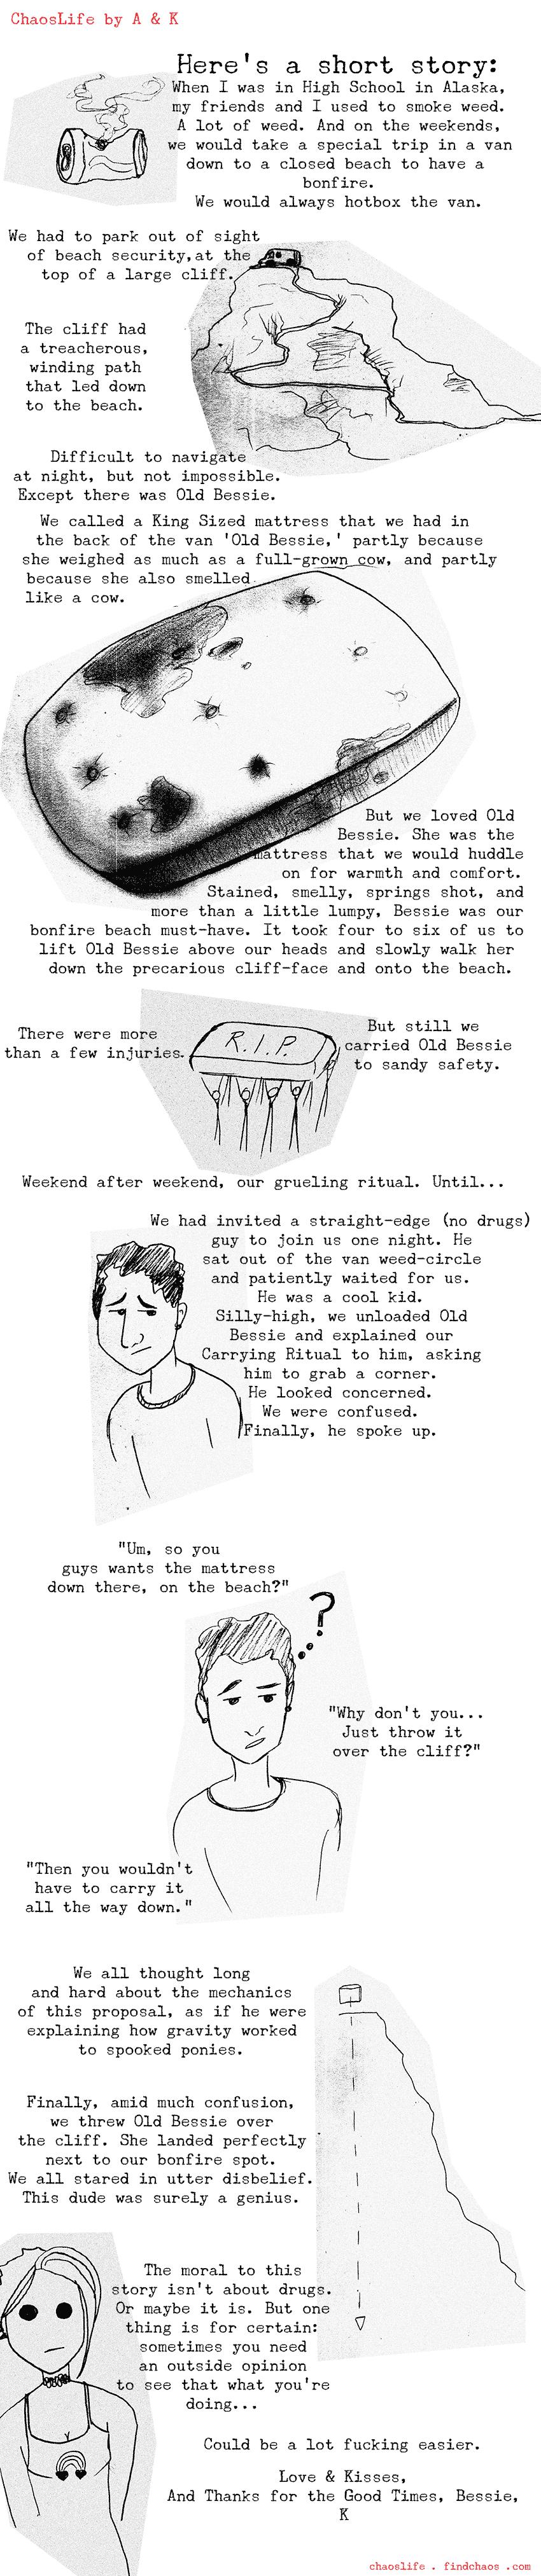 Mattress Moral